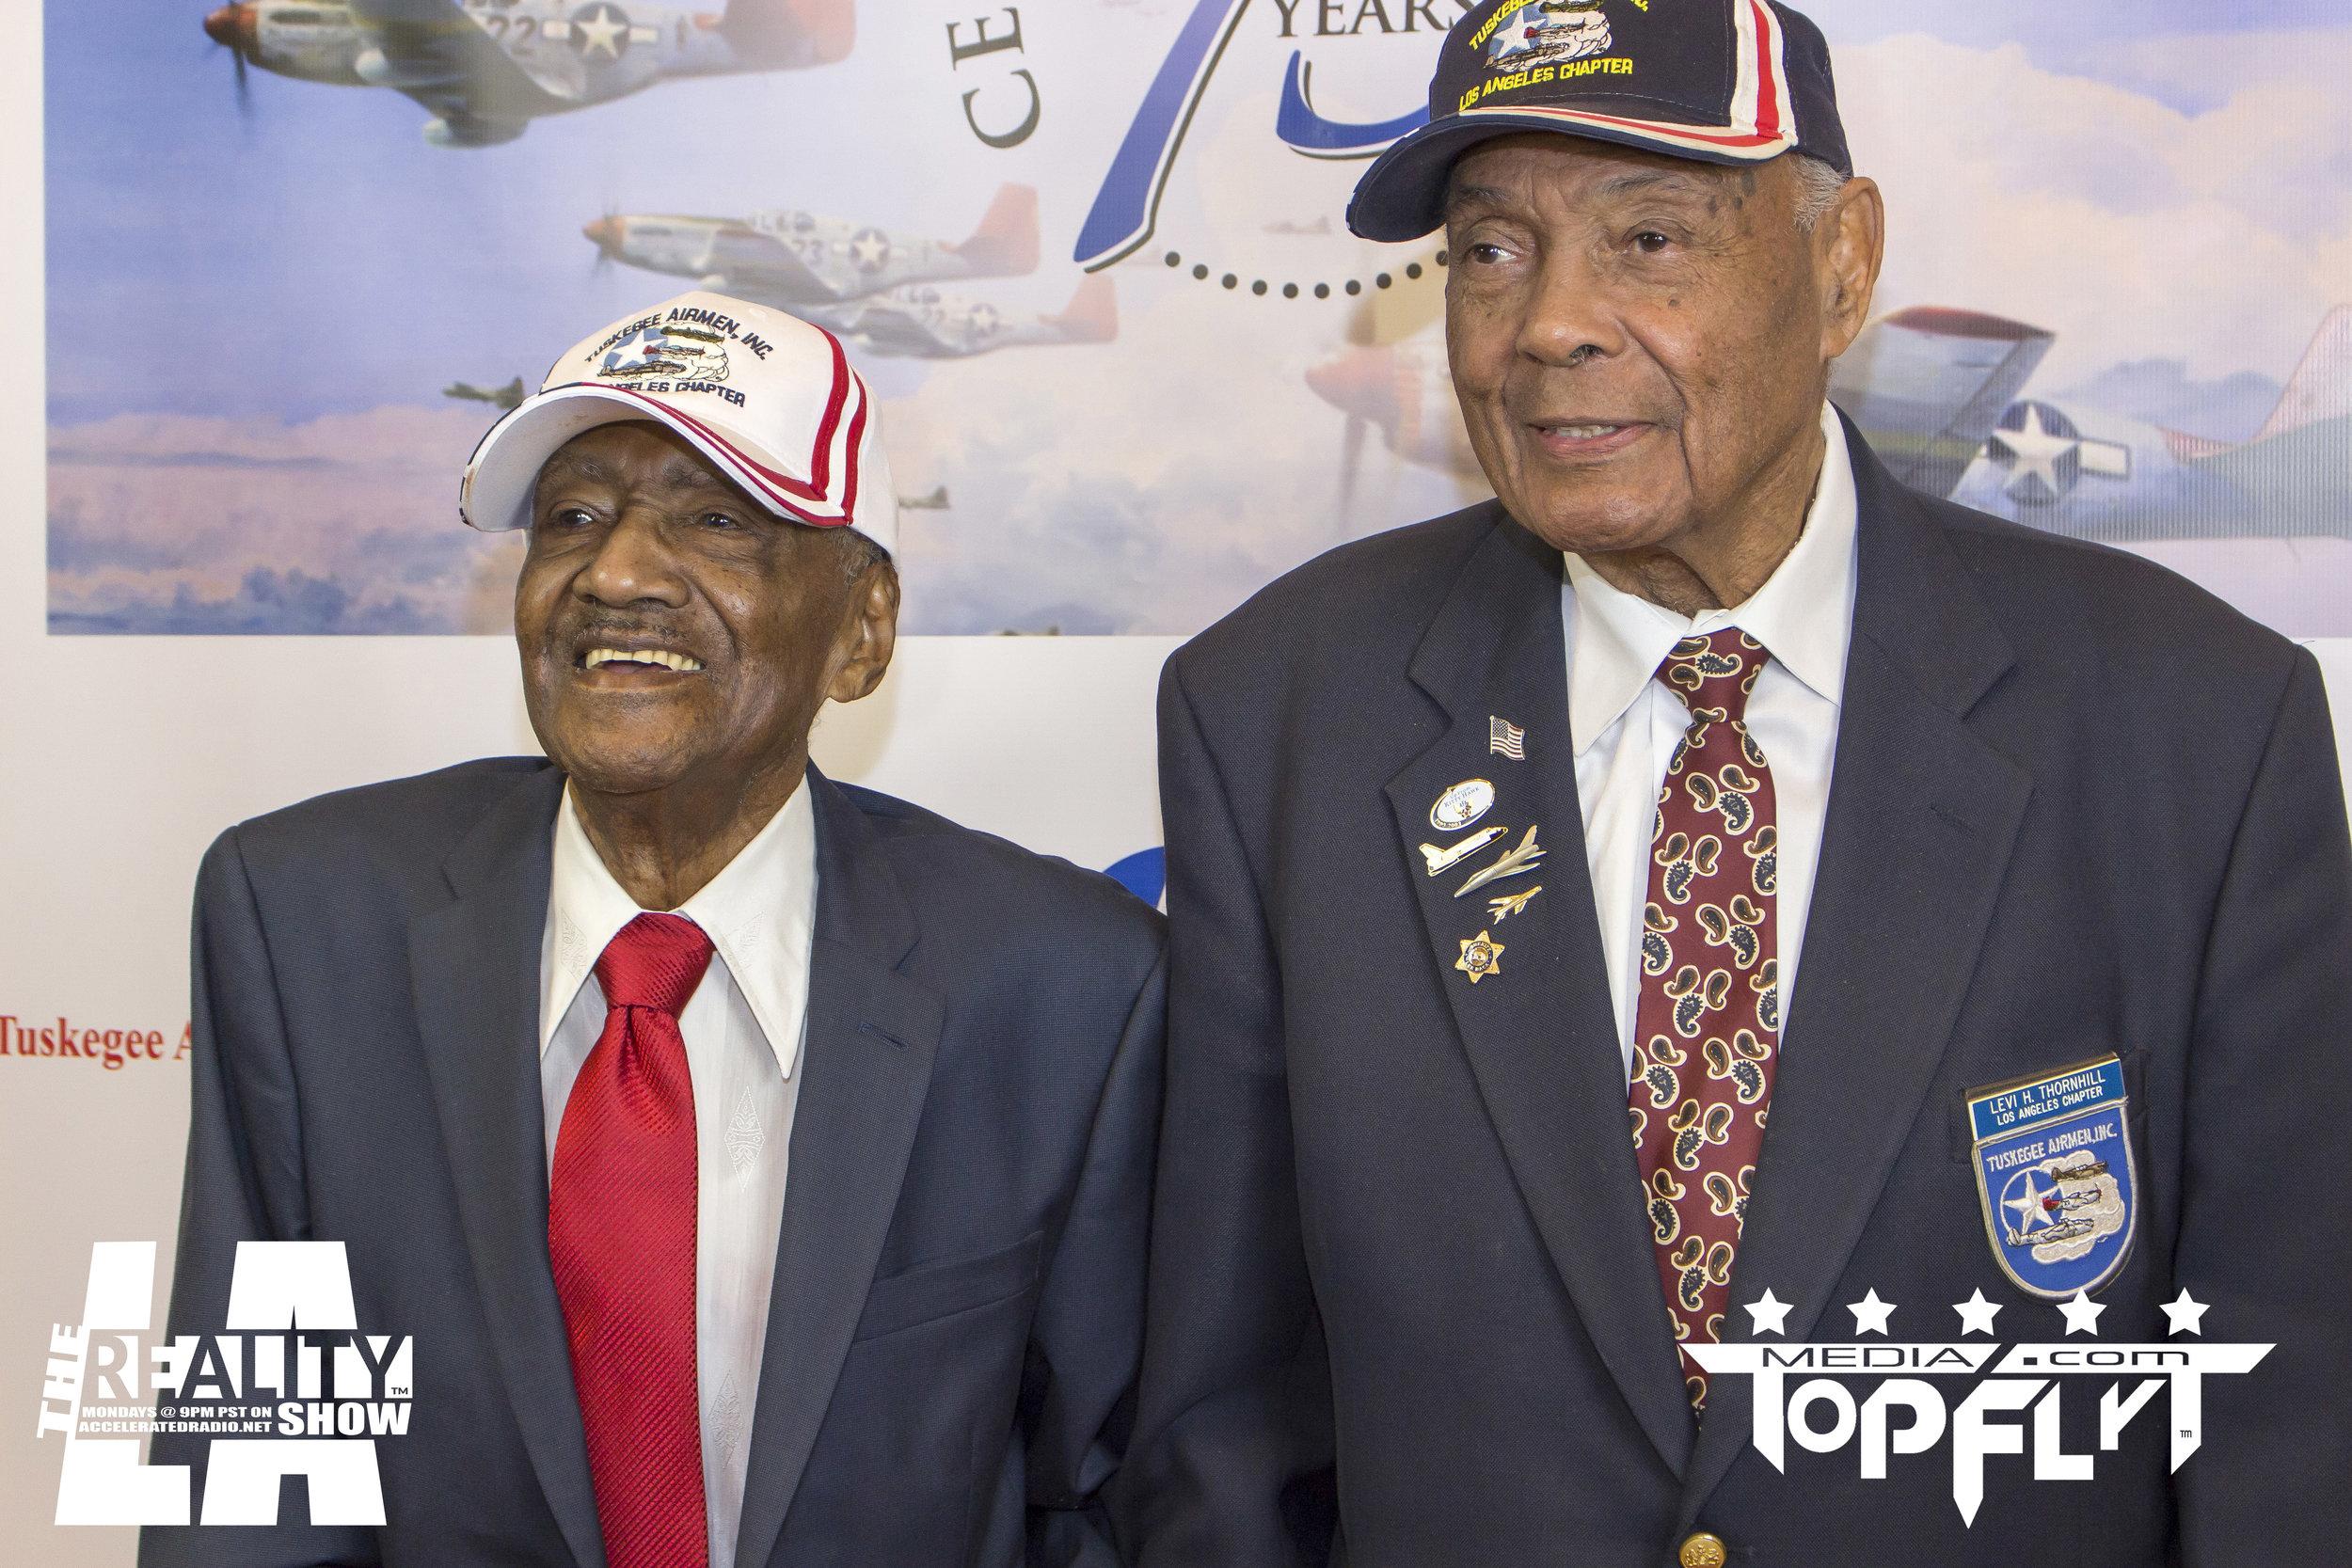 The Reality Show LA - Tuskegee Airmen 75th Anniversary VIP Reception_18.jpg